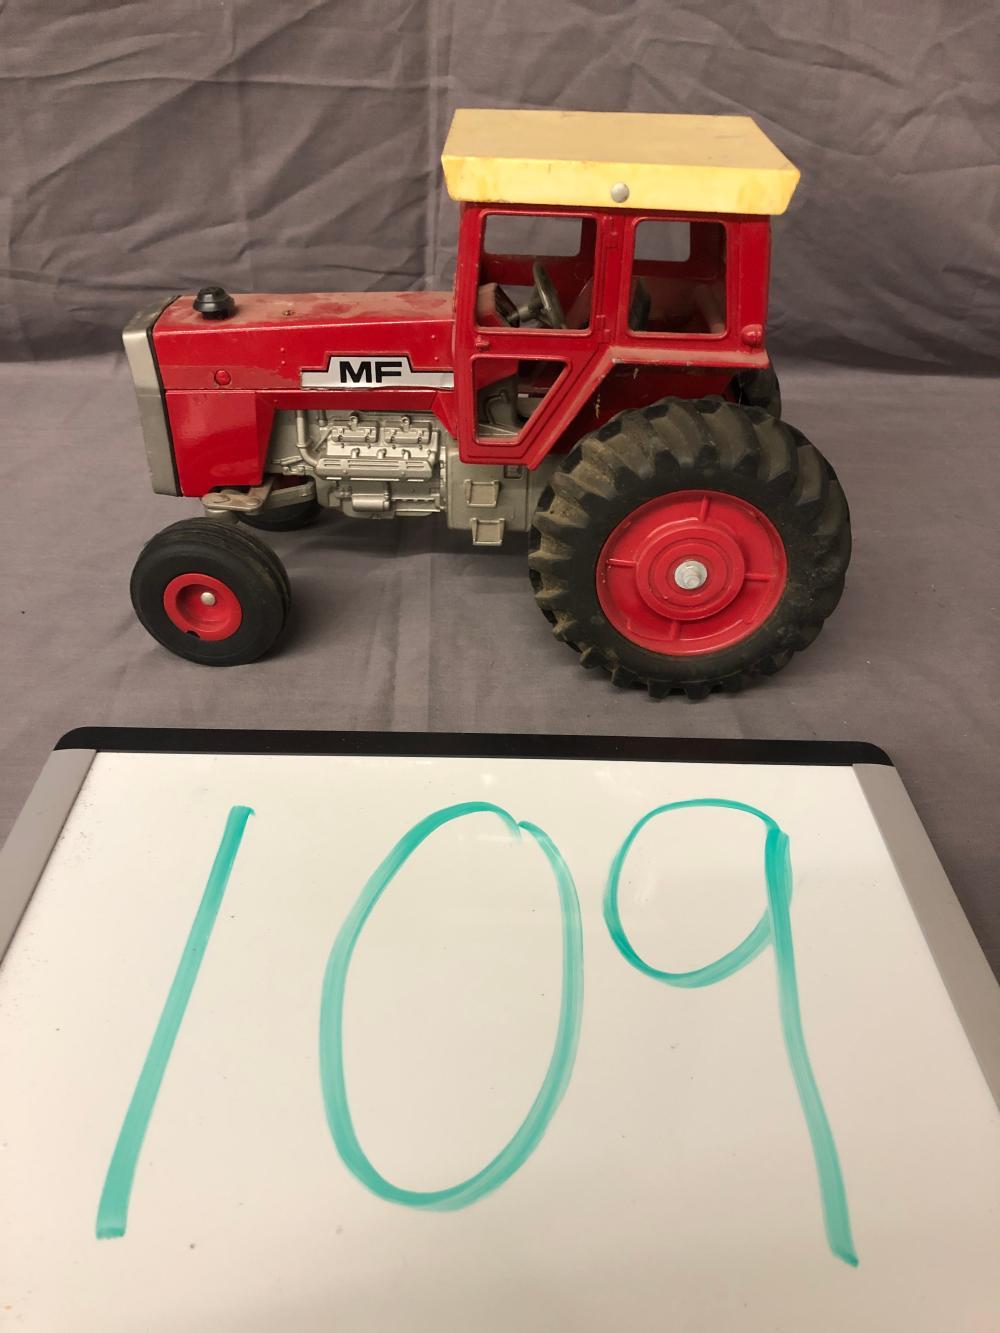 1/16th Scale Massey Ferguson 1155